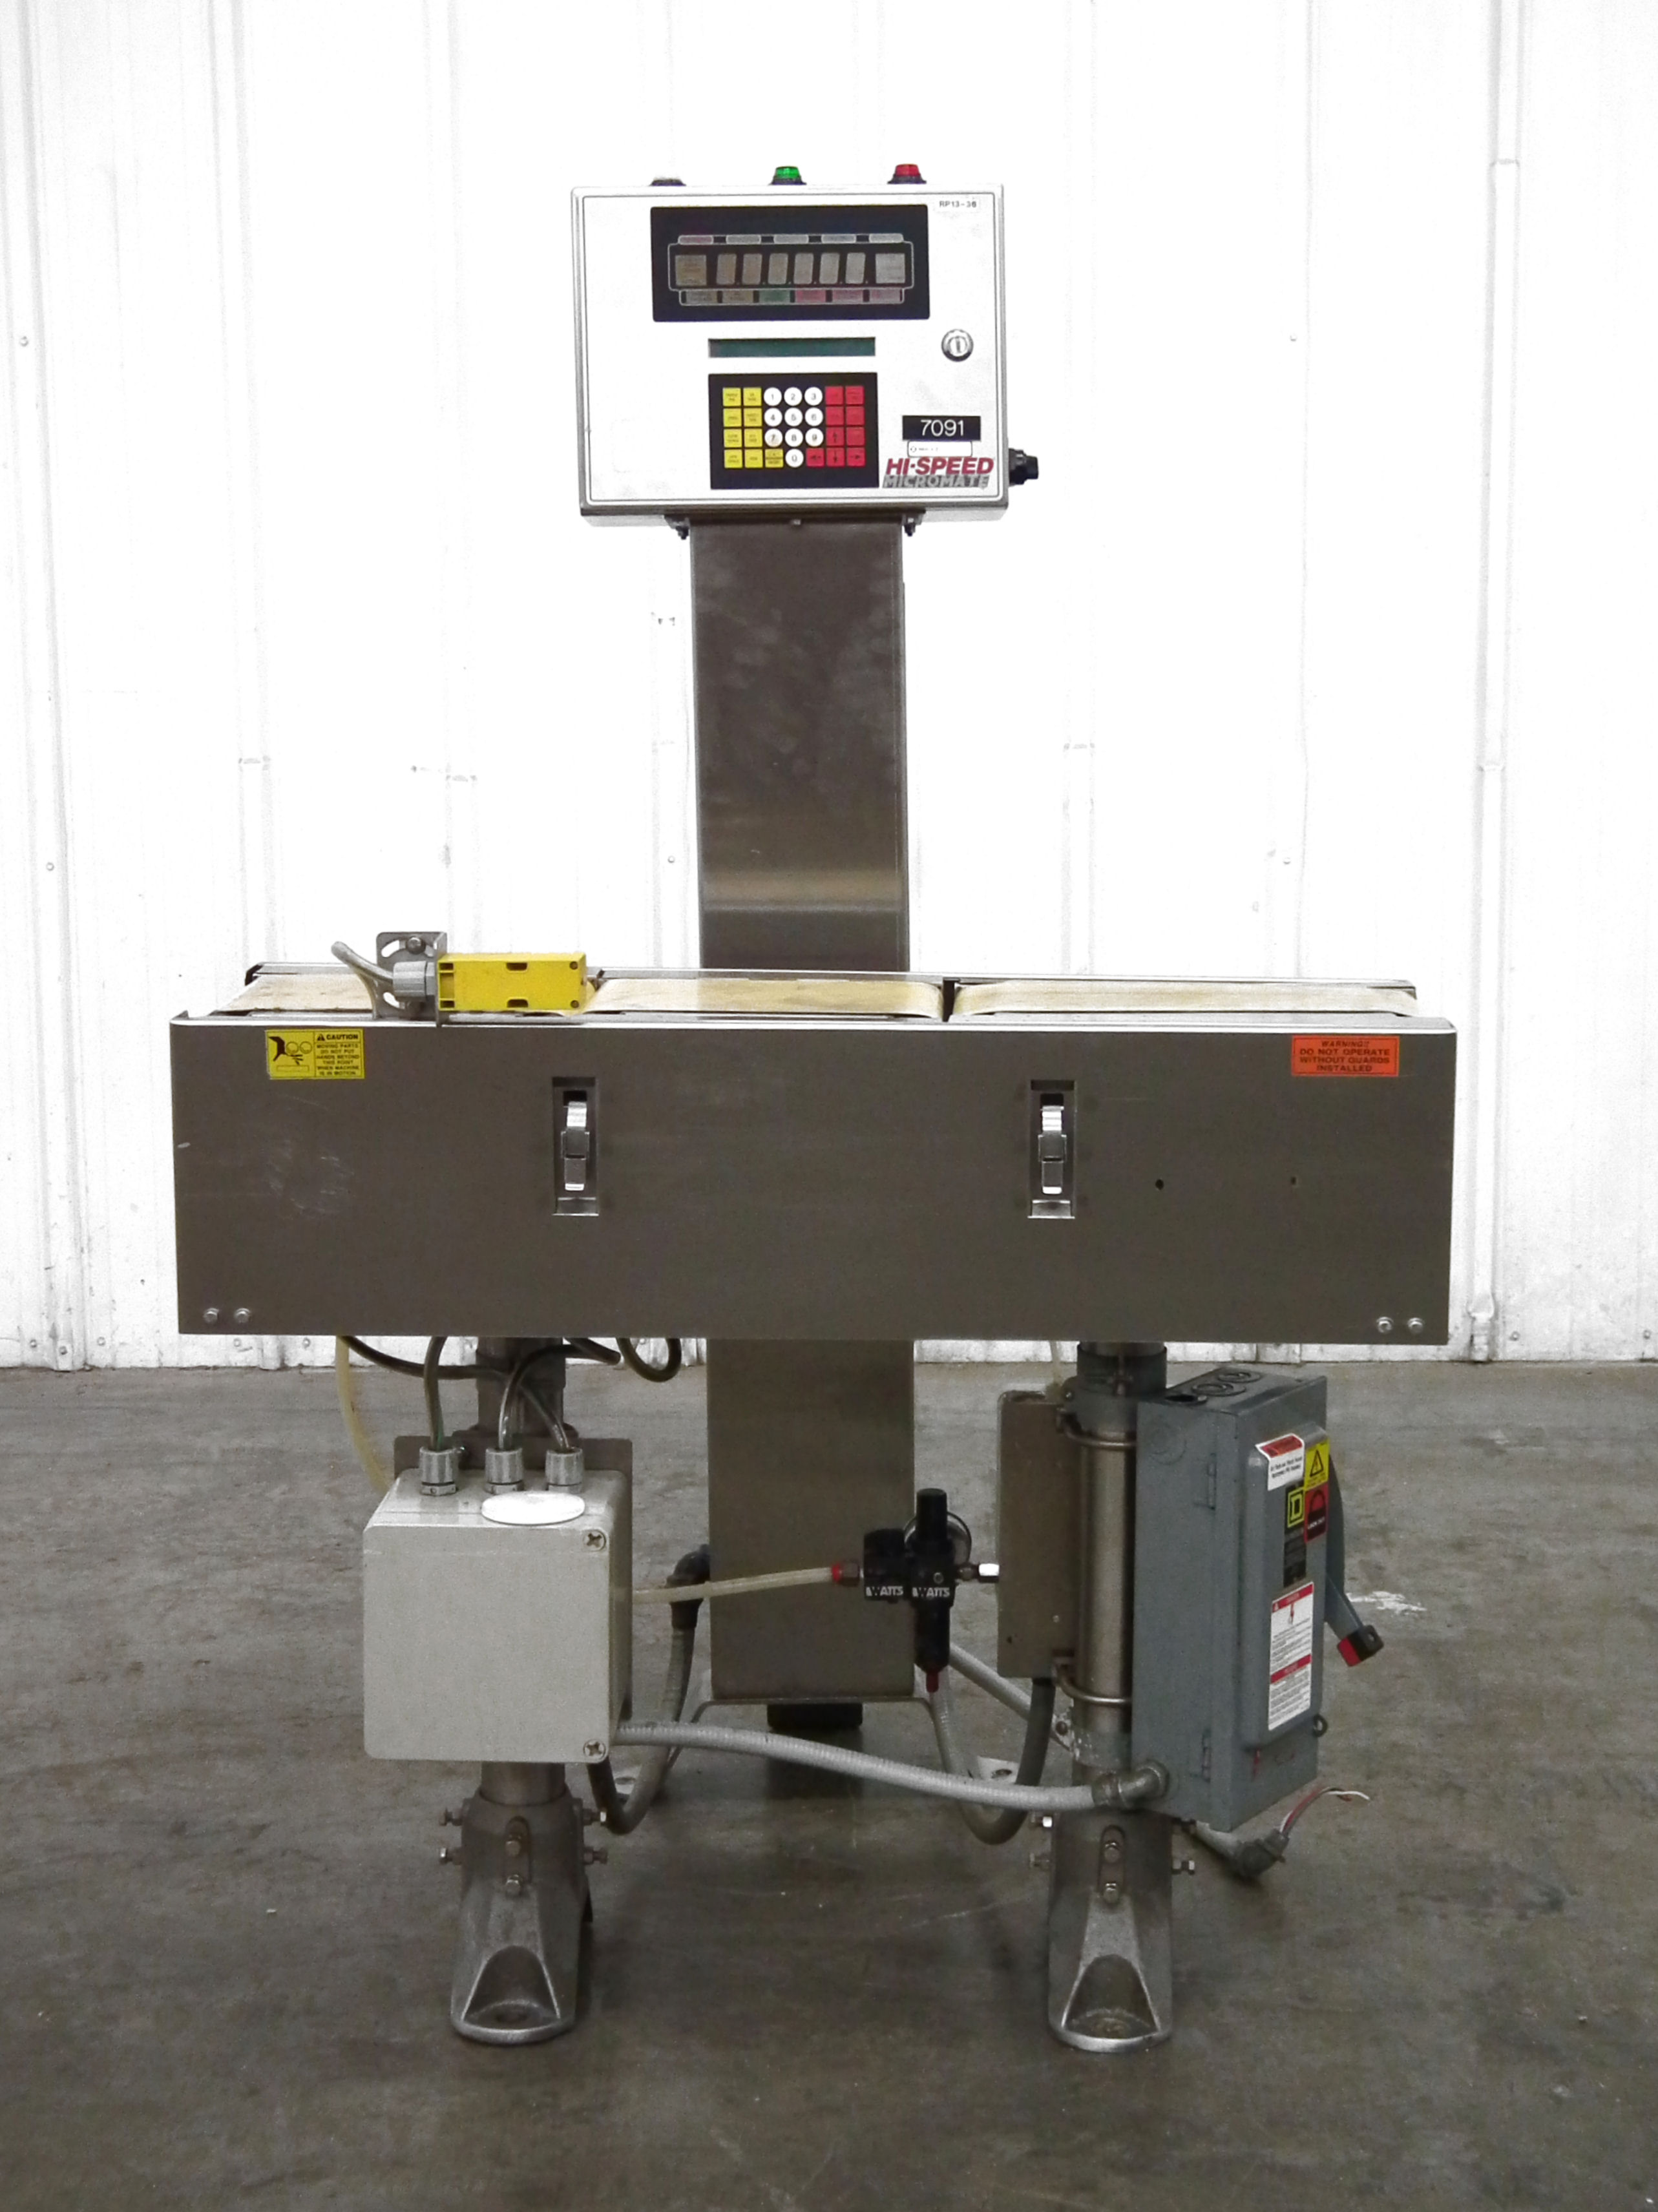 Mettler Toledo Micromate High Speed Checkweigher B3155